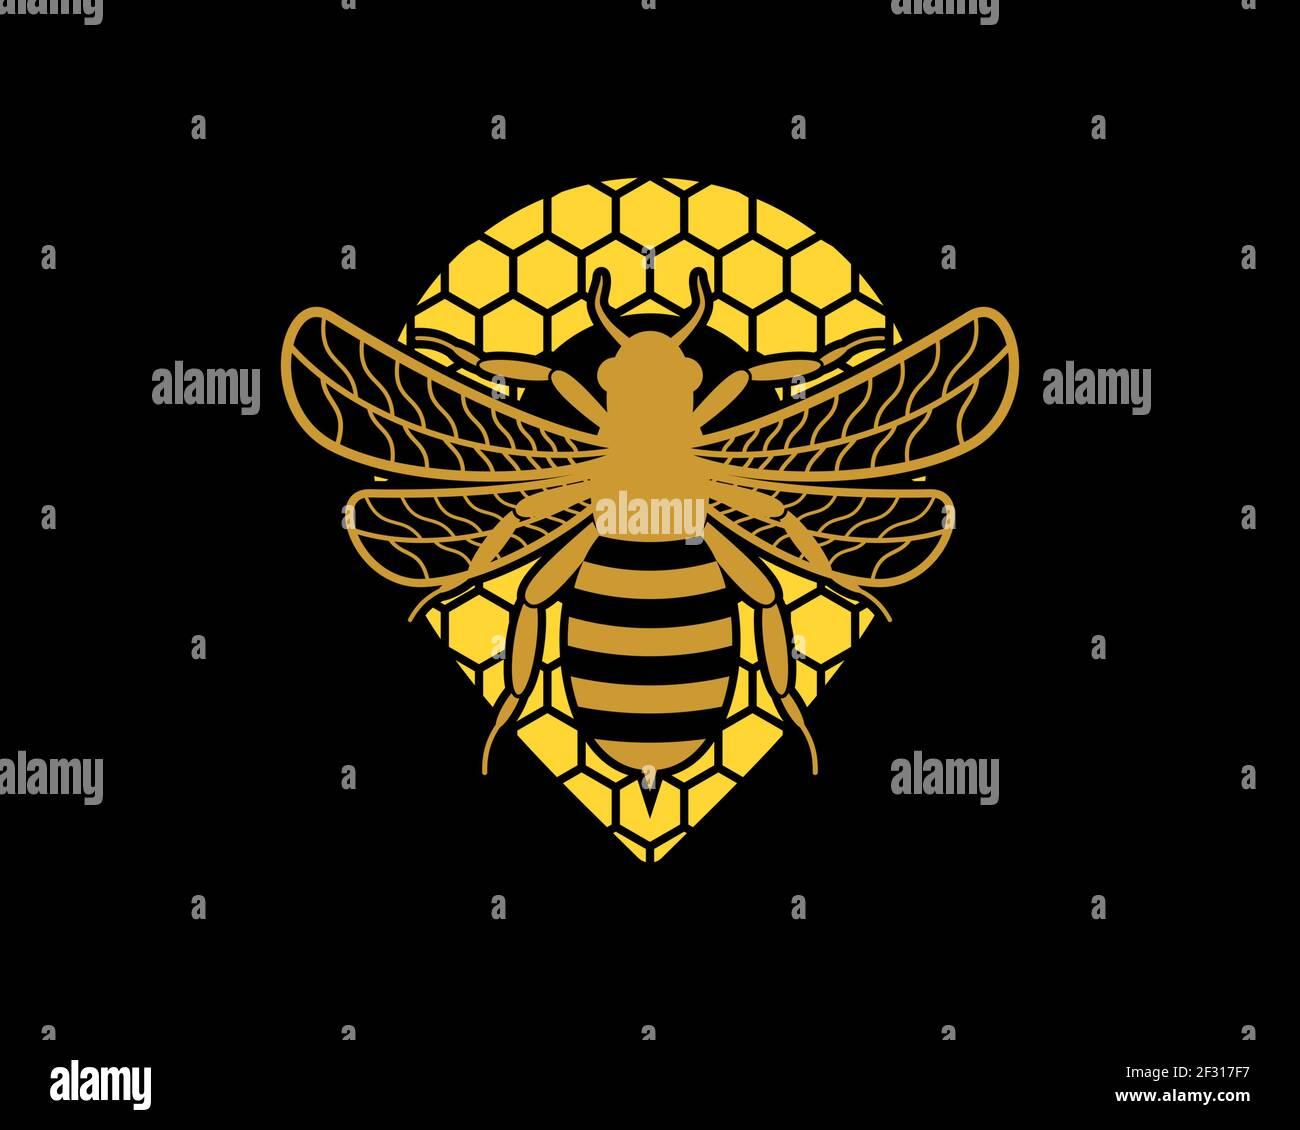 Fliegende Biene im Bienenstock mit Stecknadelform Stockfoto